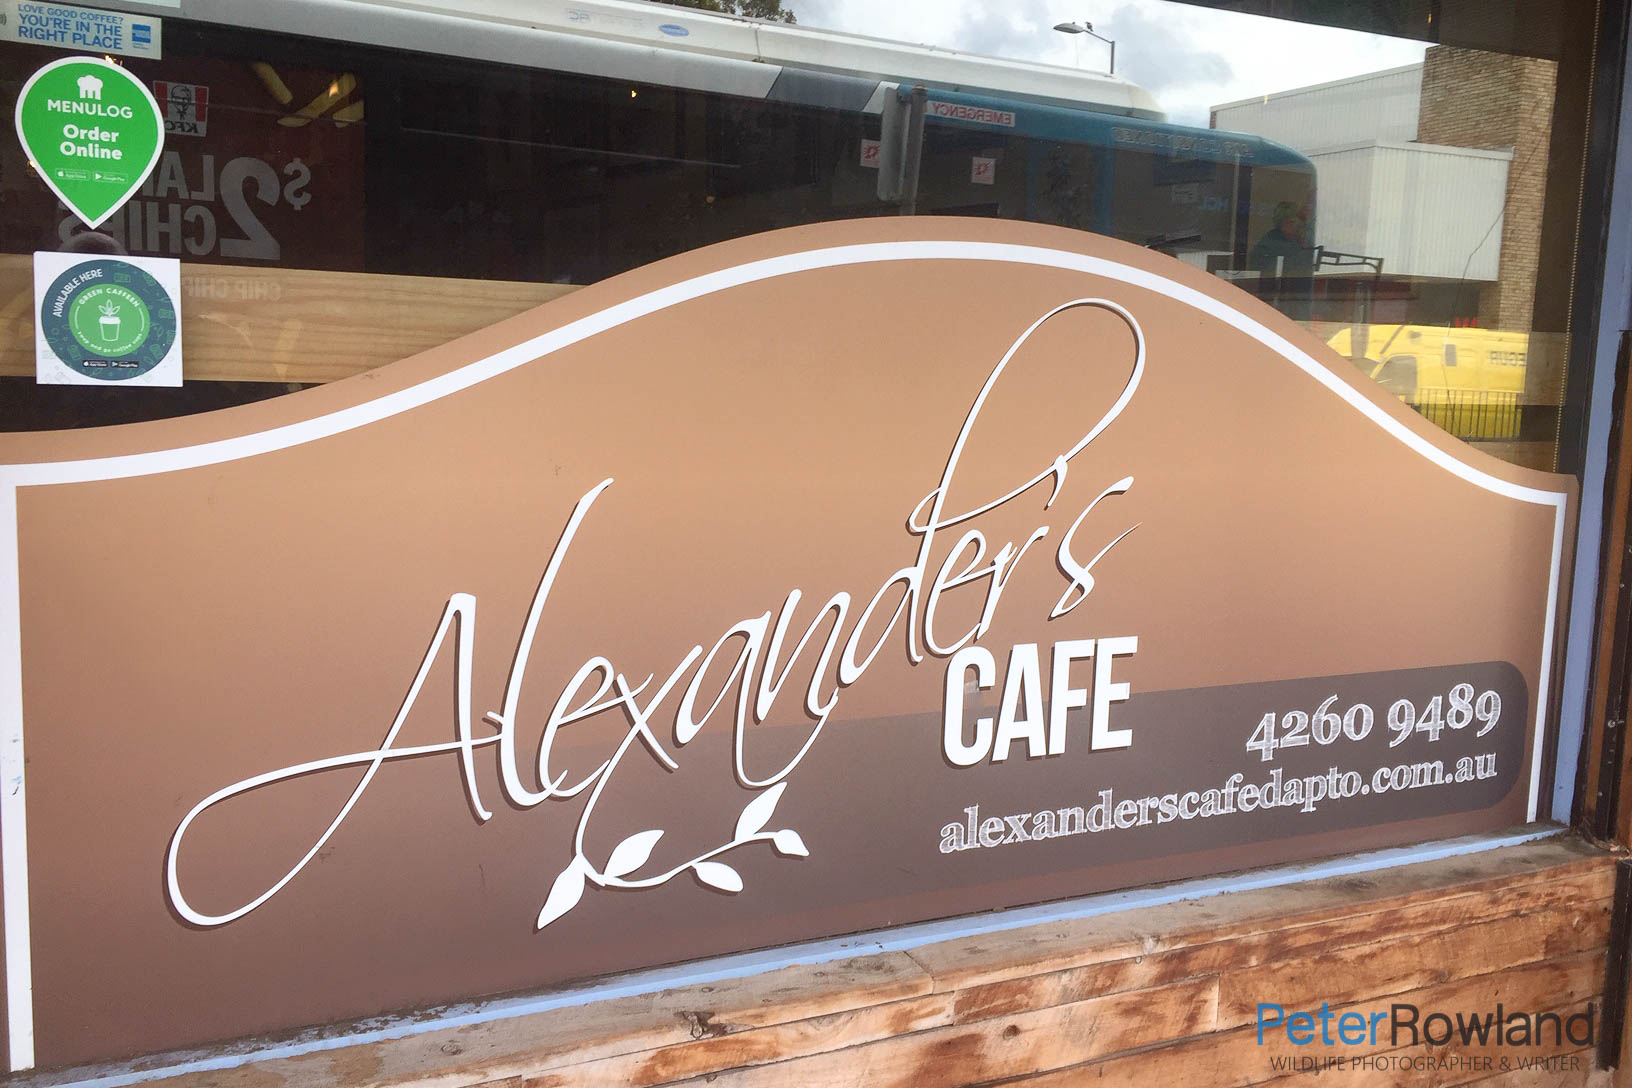 Alexanders Cafe front window